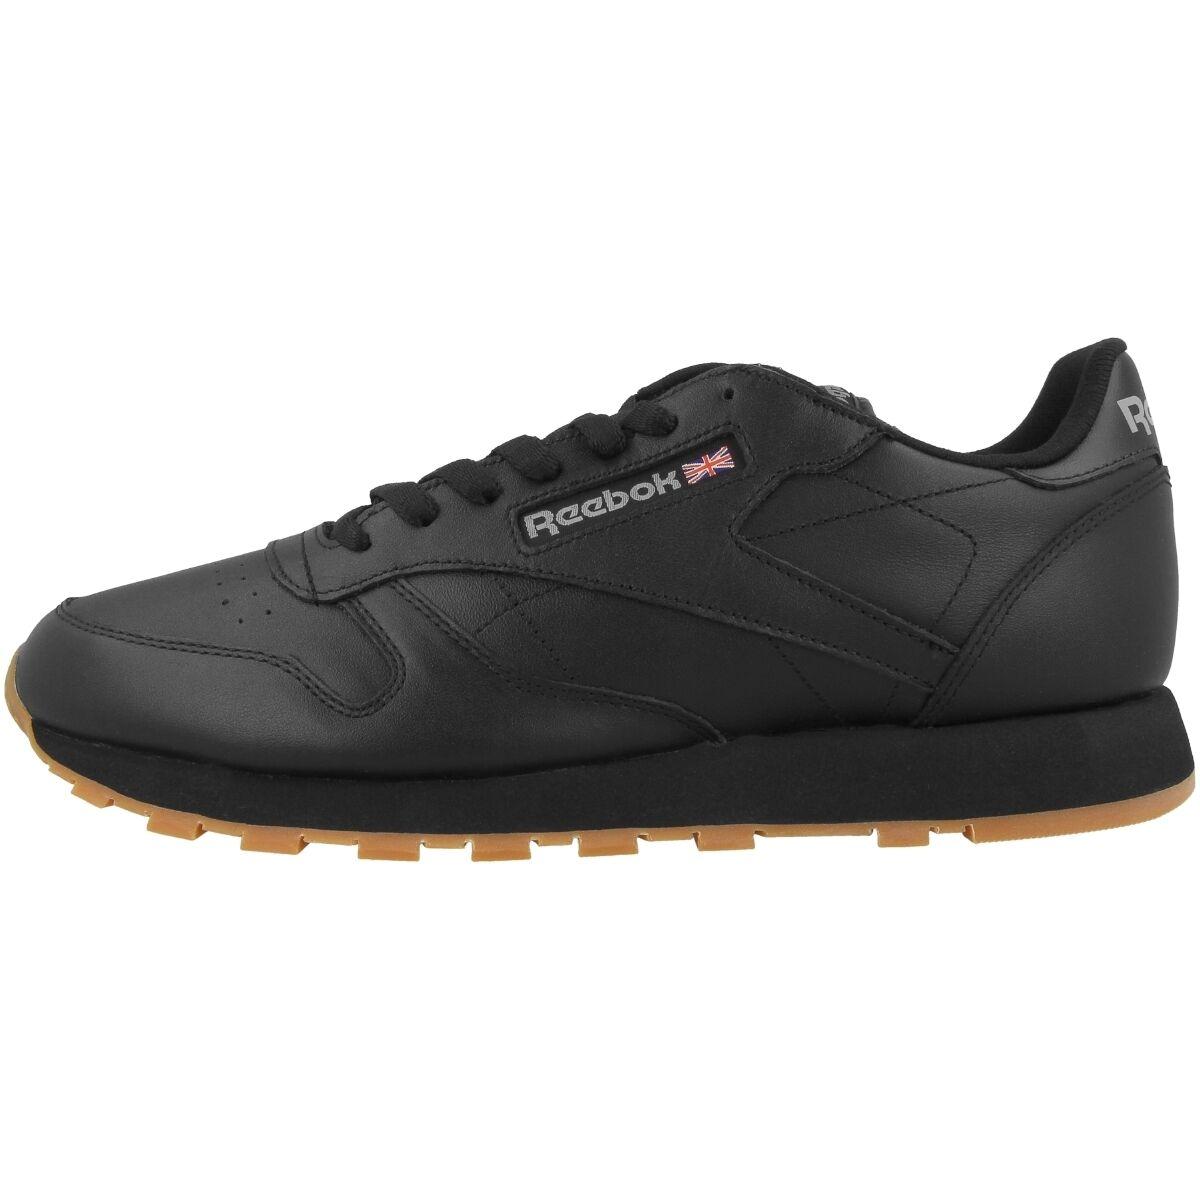 Reebok Classic Leather cortos zapatos negro Gum 49800 ocio Sport Fitness